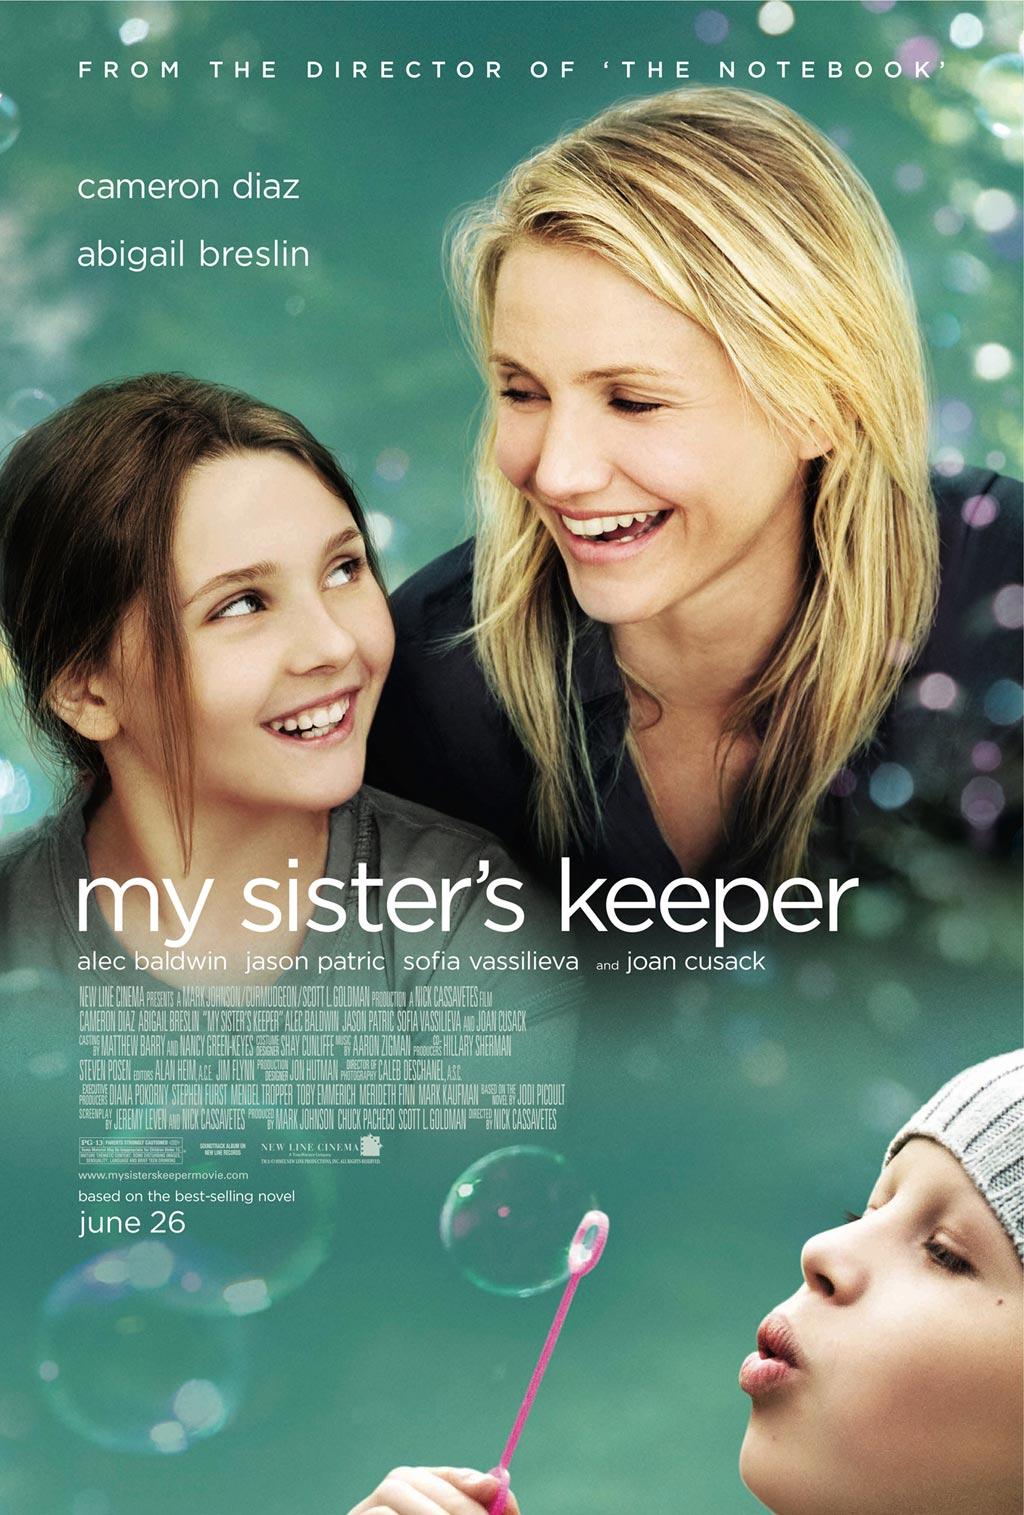 http://4.bp.blogspot.com/_7IYT2RwaB4w/S5Qh-2_u-JI/AAAAAAAACkA/0-68AvnWBmU/s1600/my_sisters_keeper.jpg